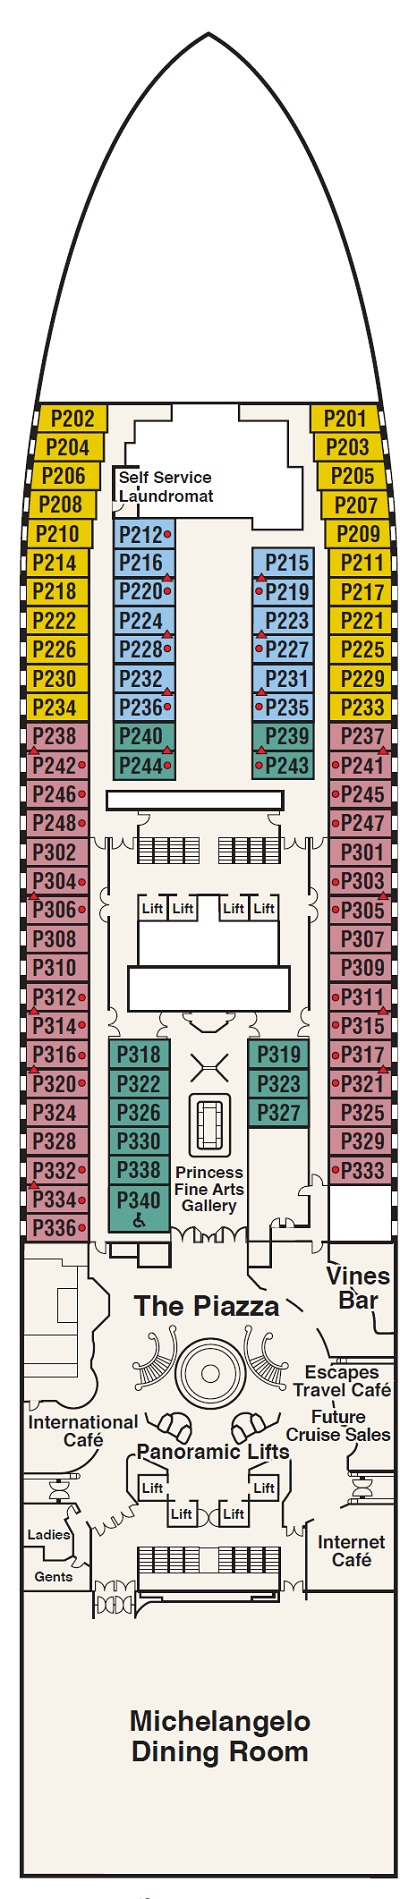 Deck 5 - Plaza